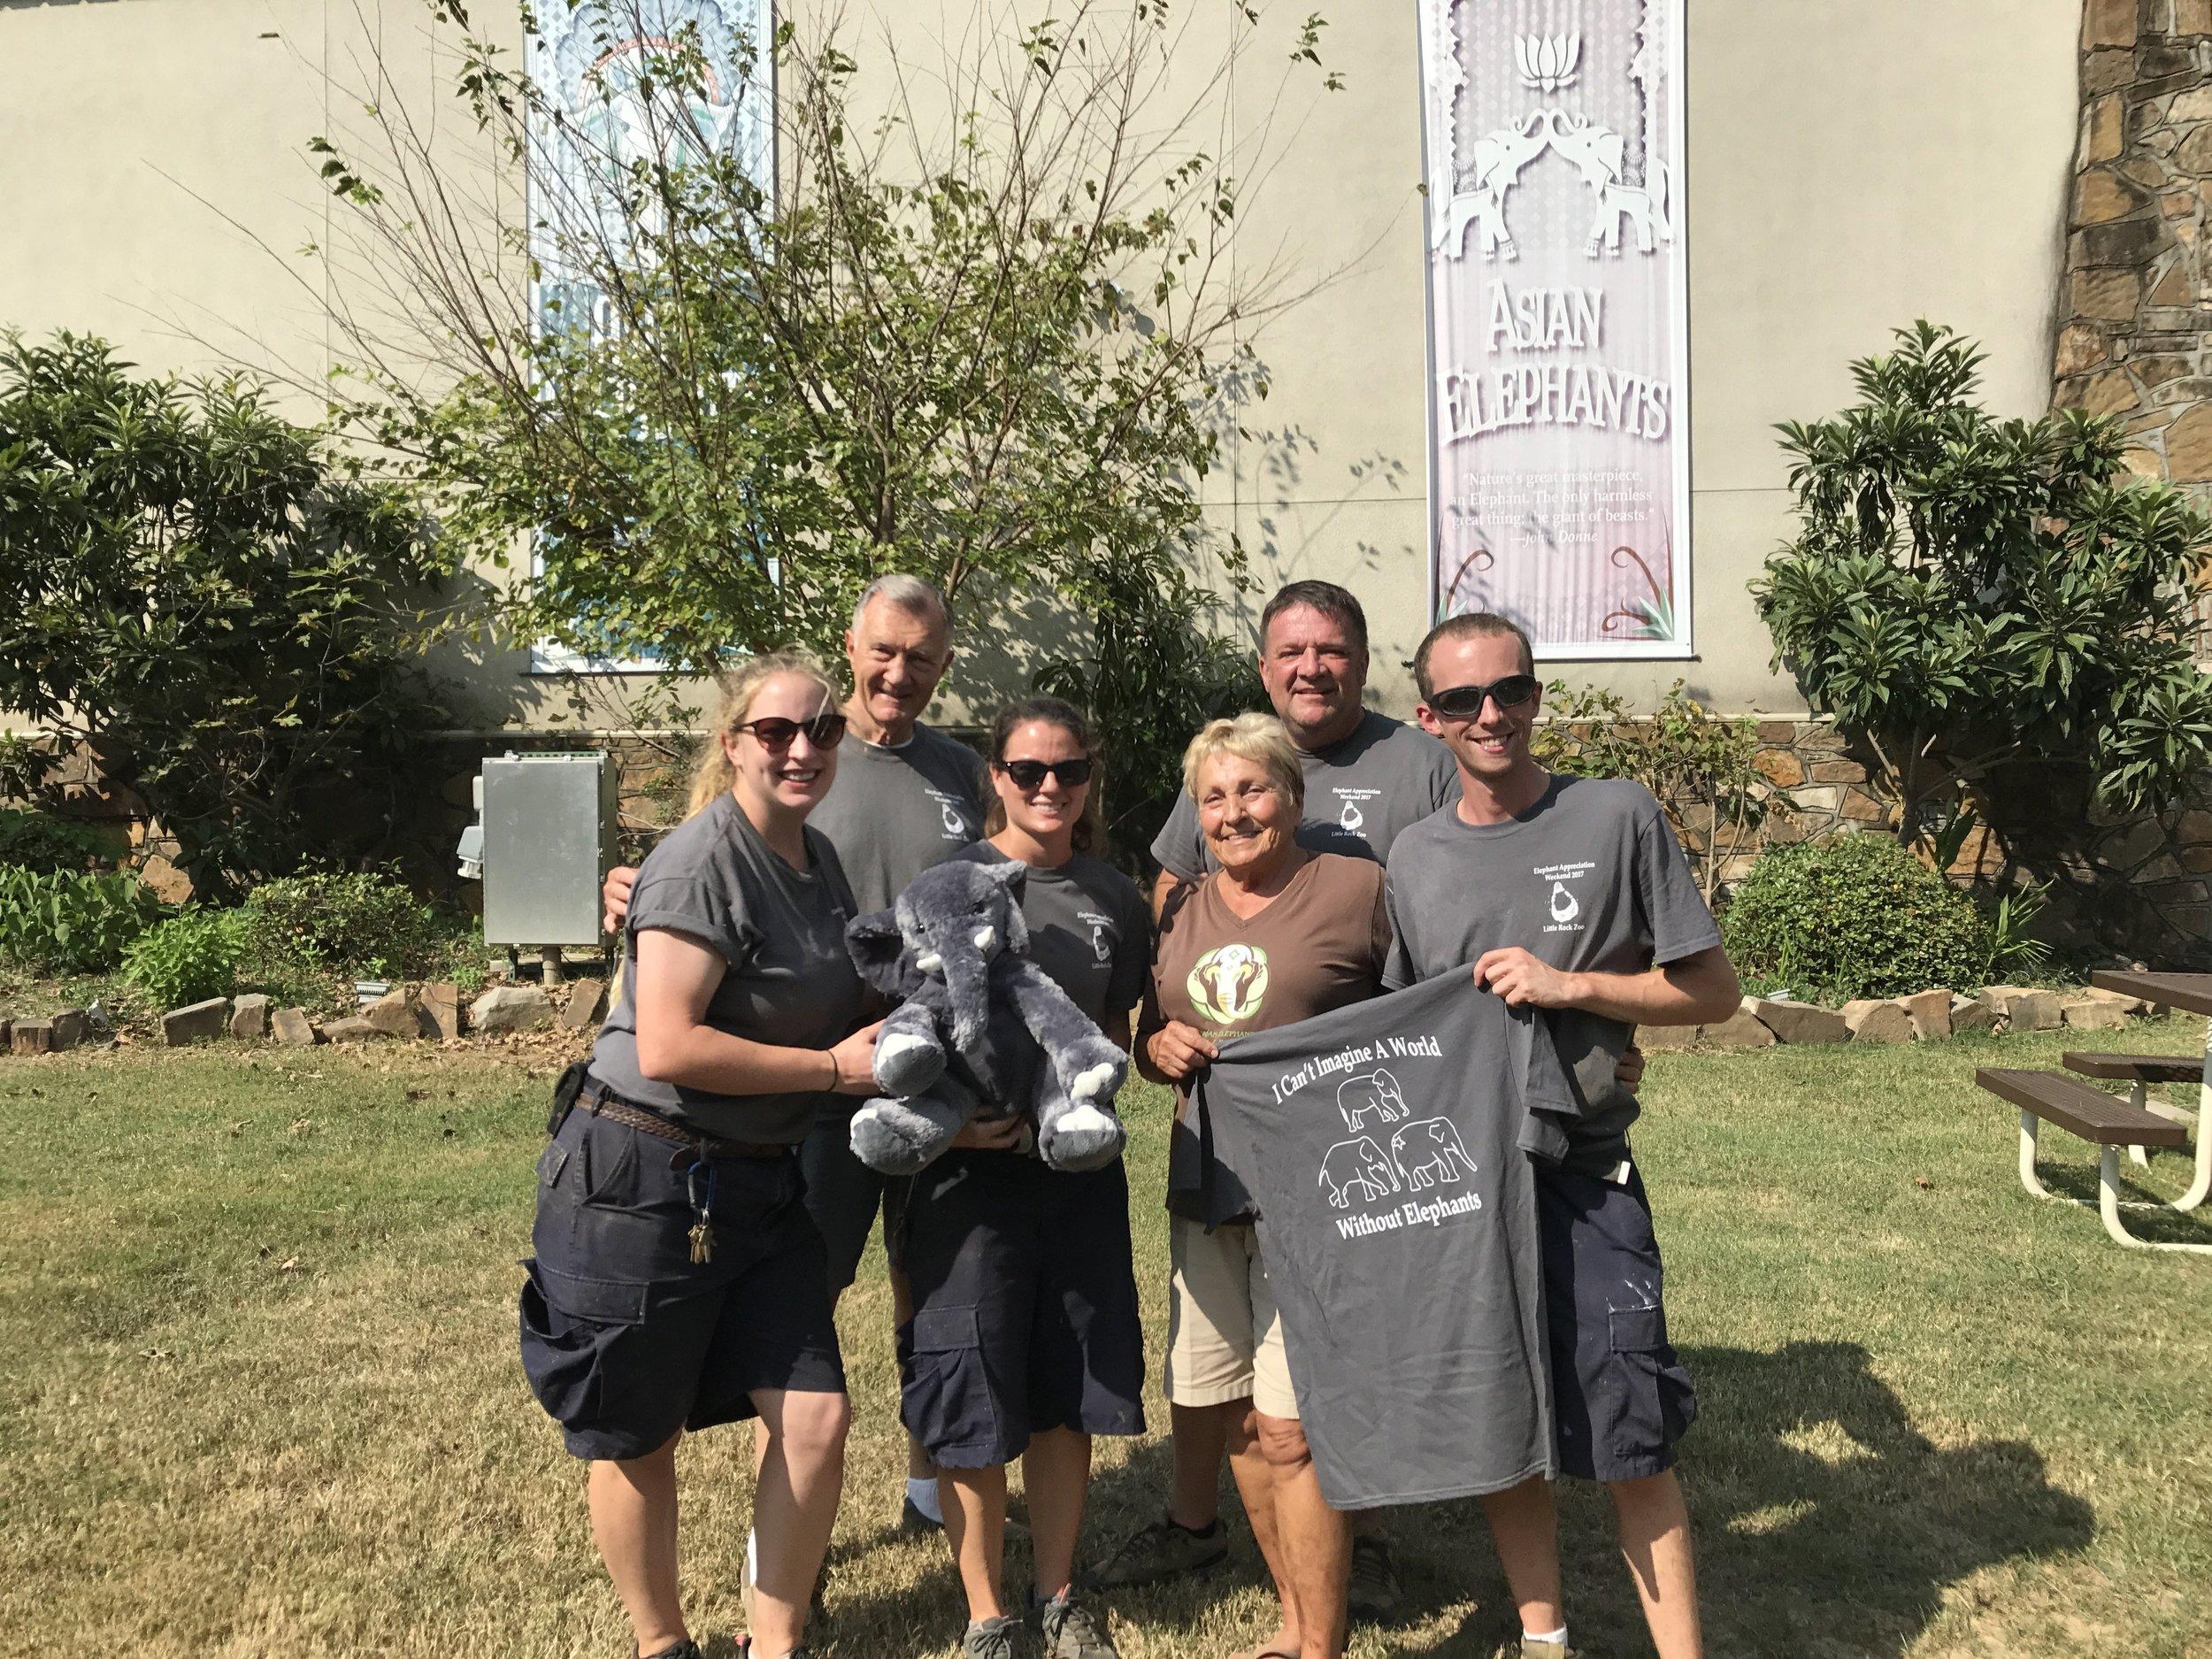 Linda, Carl, and the LRZ Elephant Crew